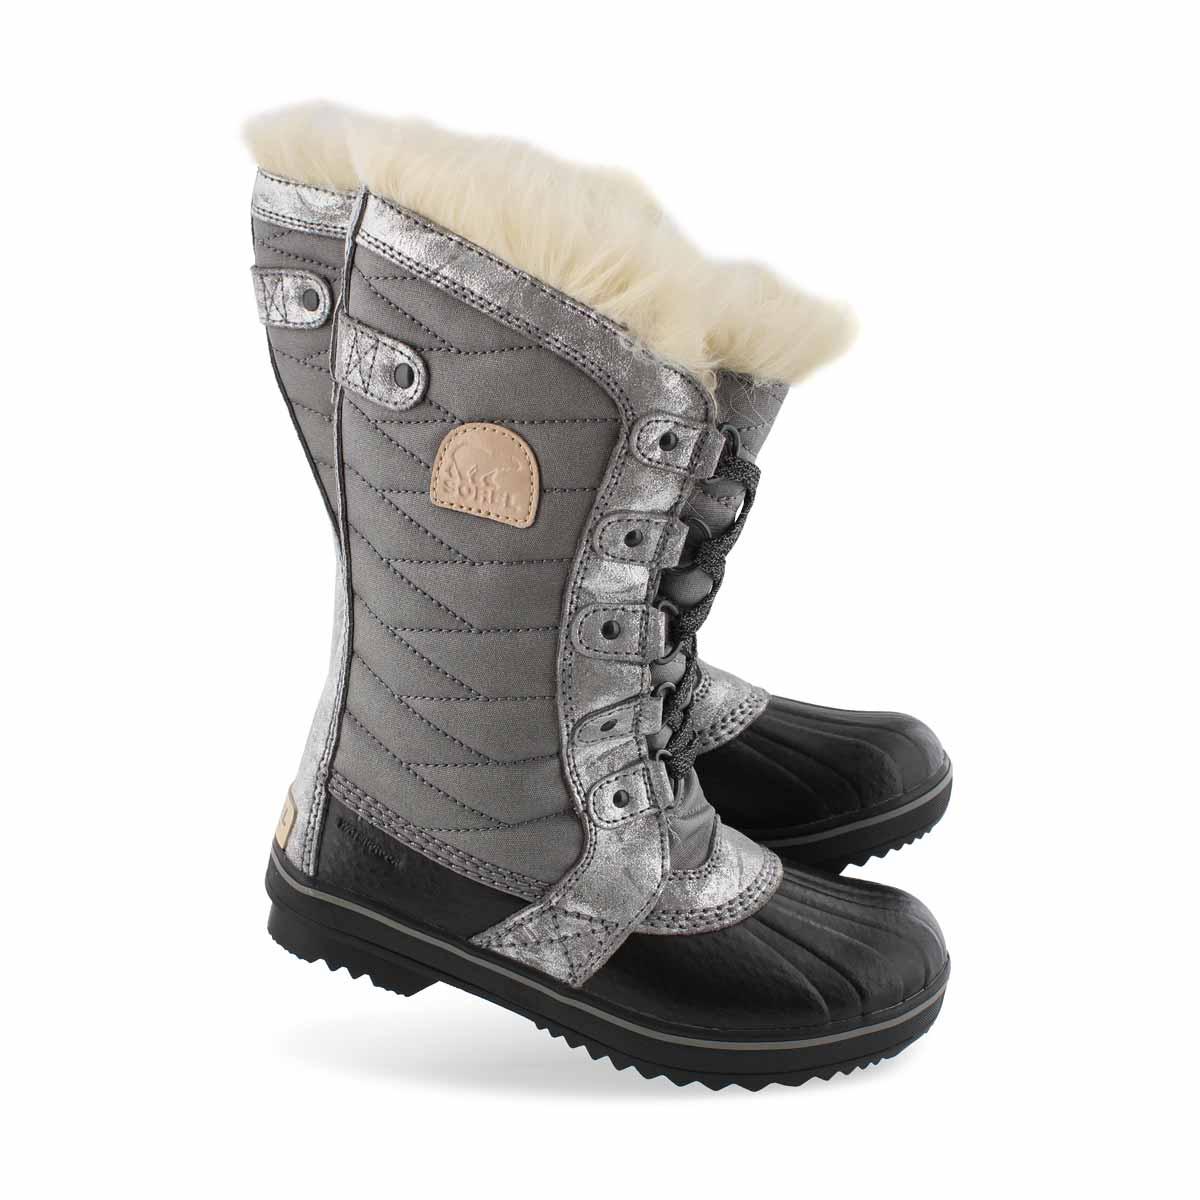 Girls' TOFINO II  quarry waterproof snow boots